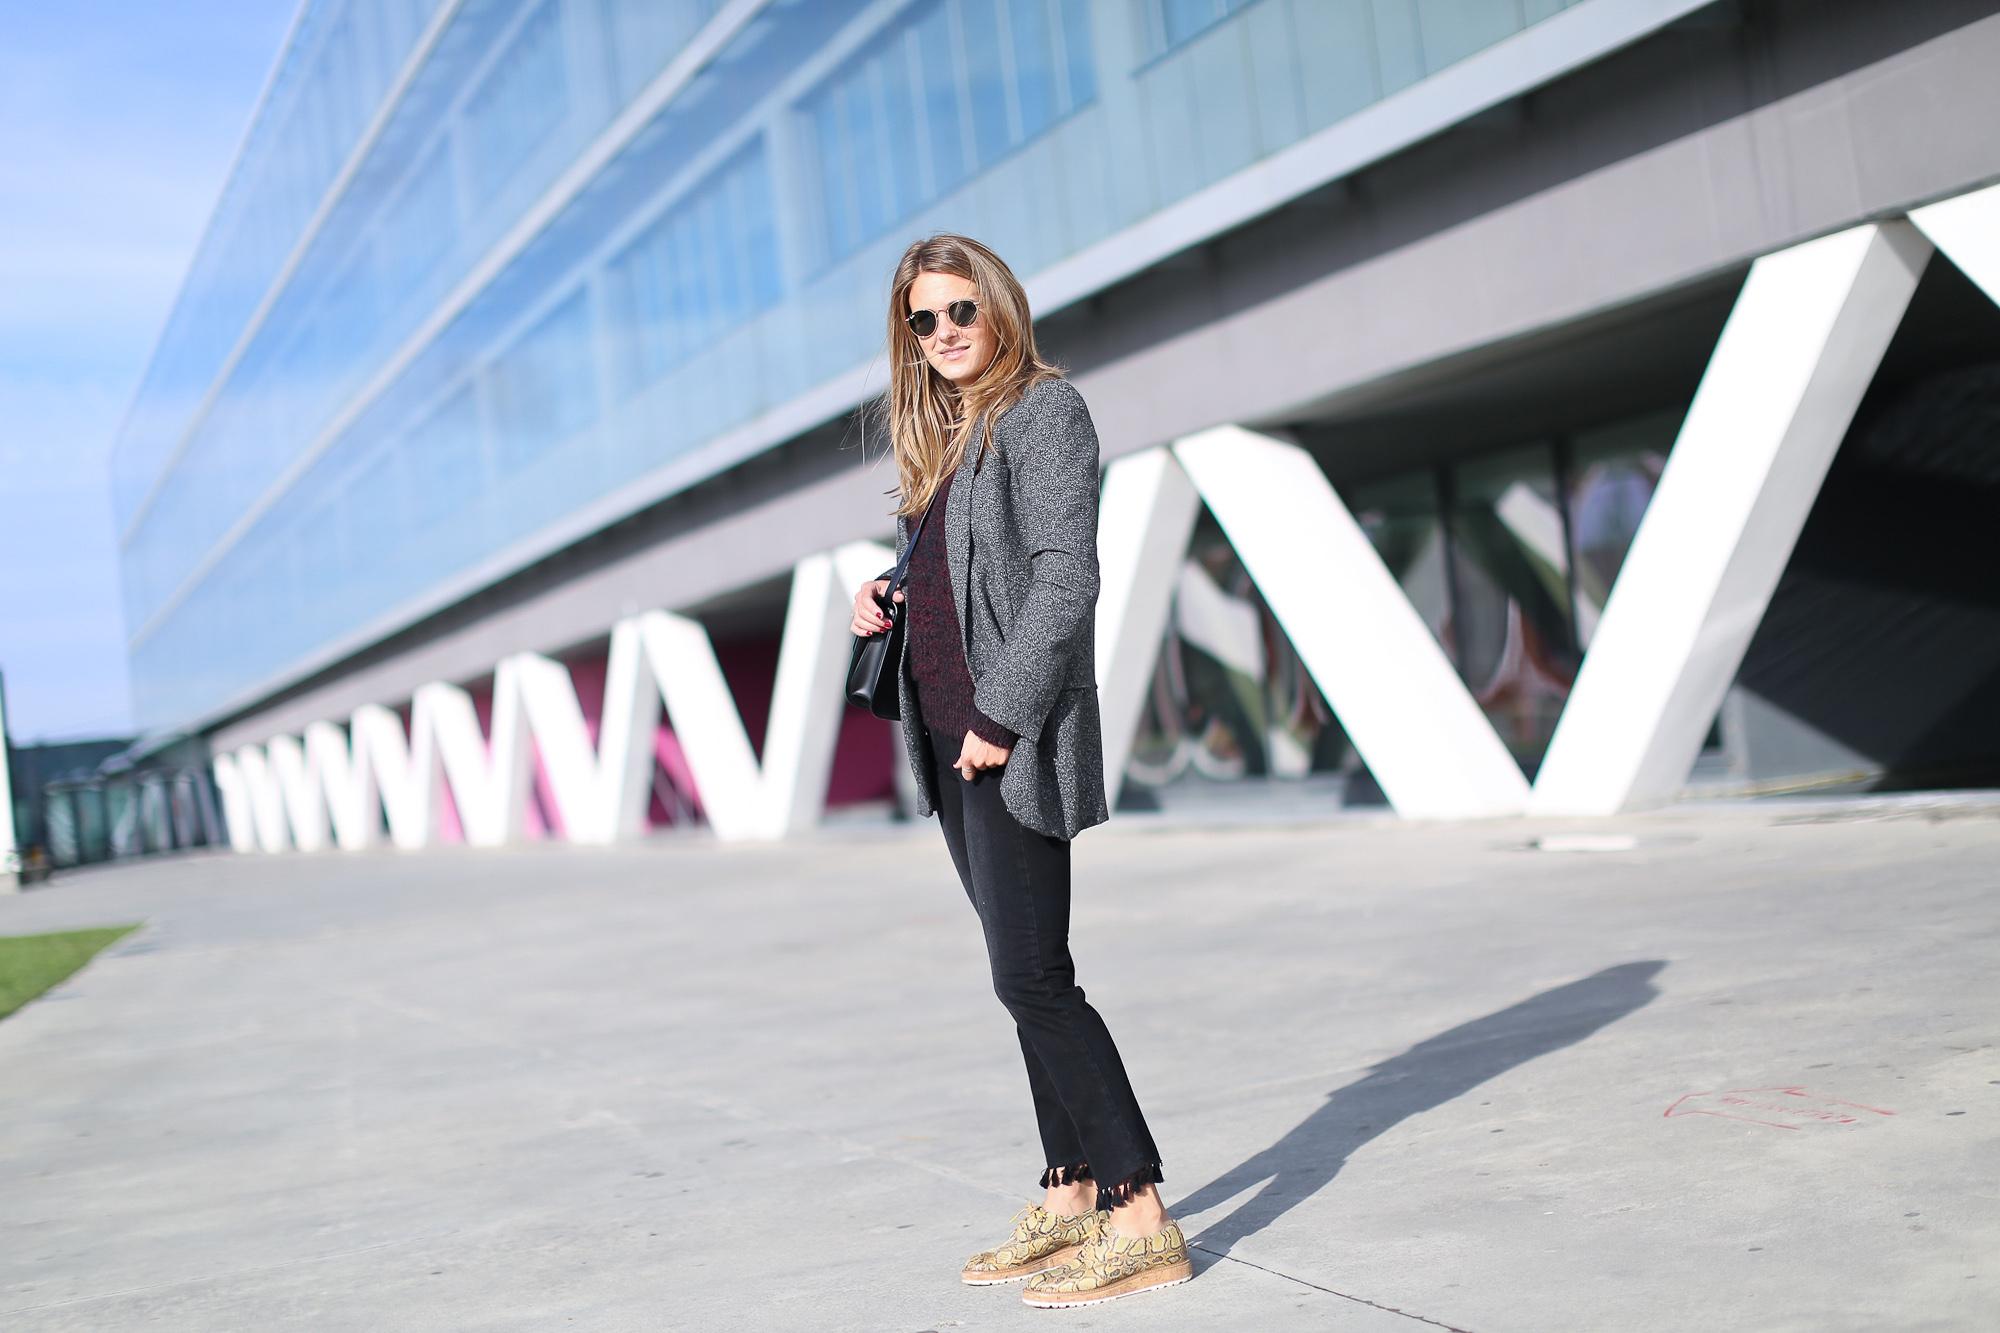 Clochet_streetstyle_fashionblogger_bilbao_zapatospielpertiniestampadoserpientepiton_zarajeansborlaspompones-2